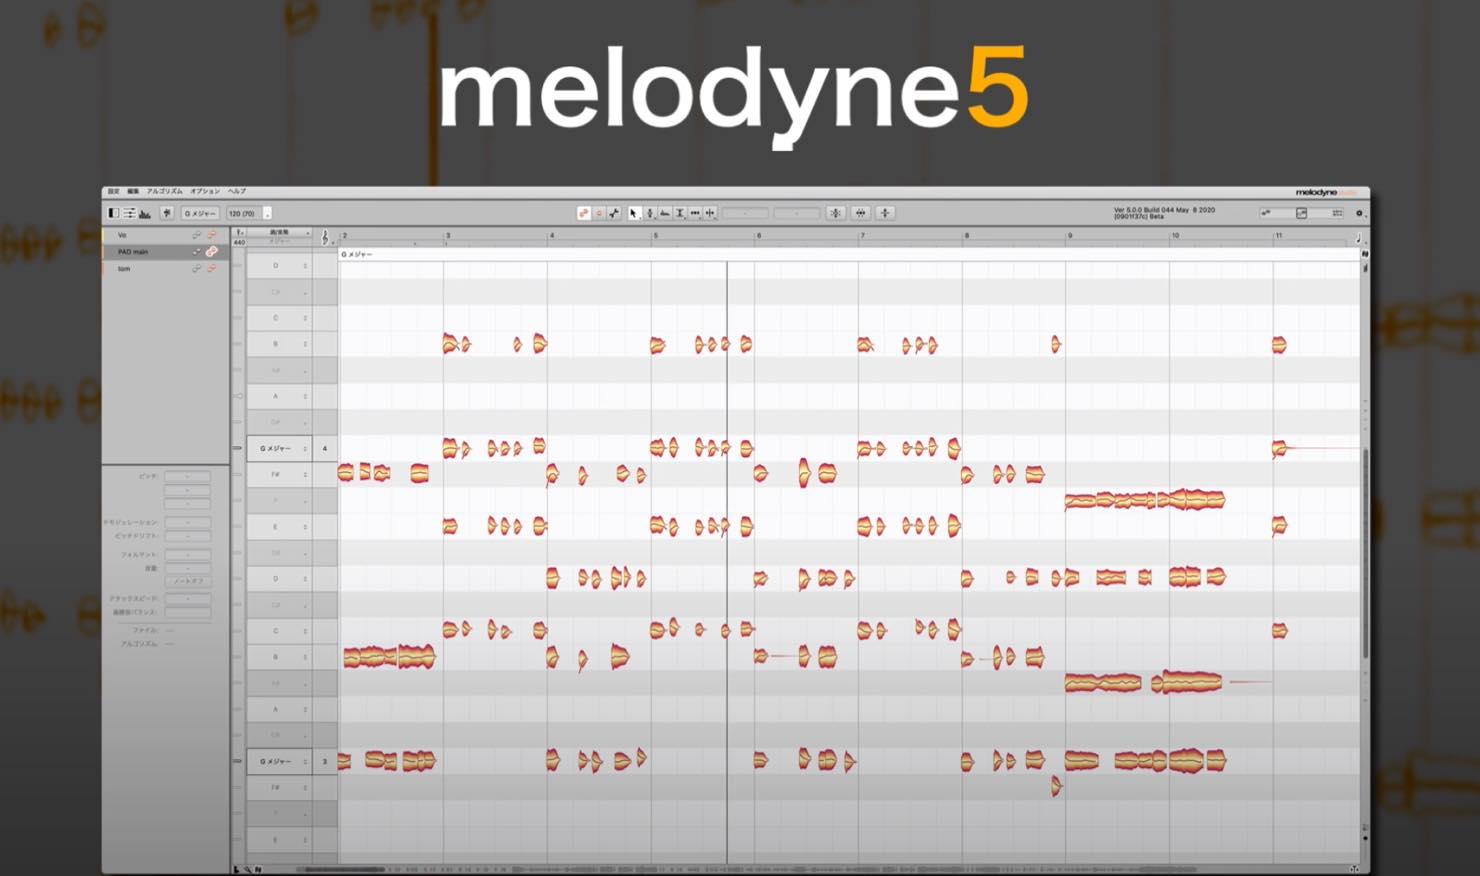 melodyne5